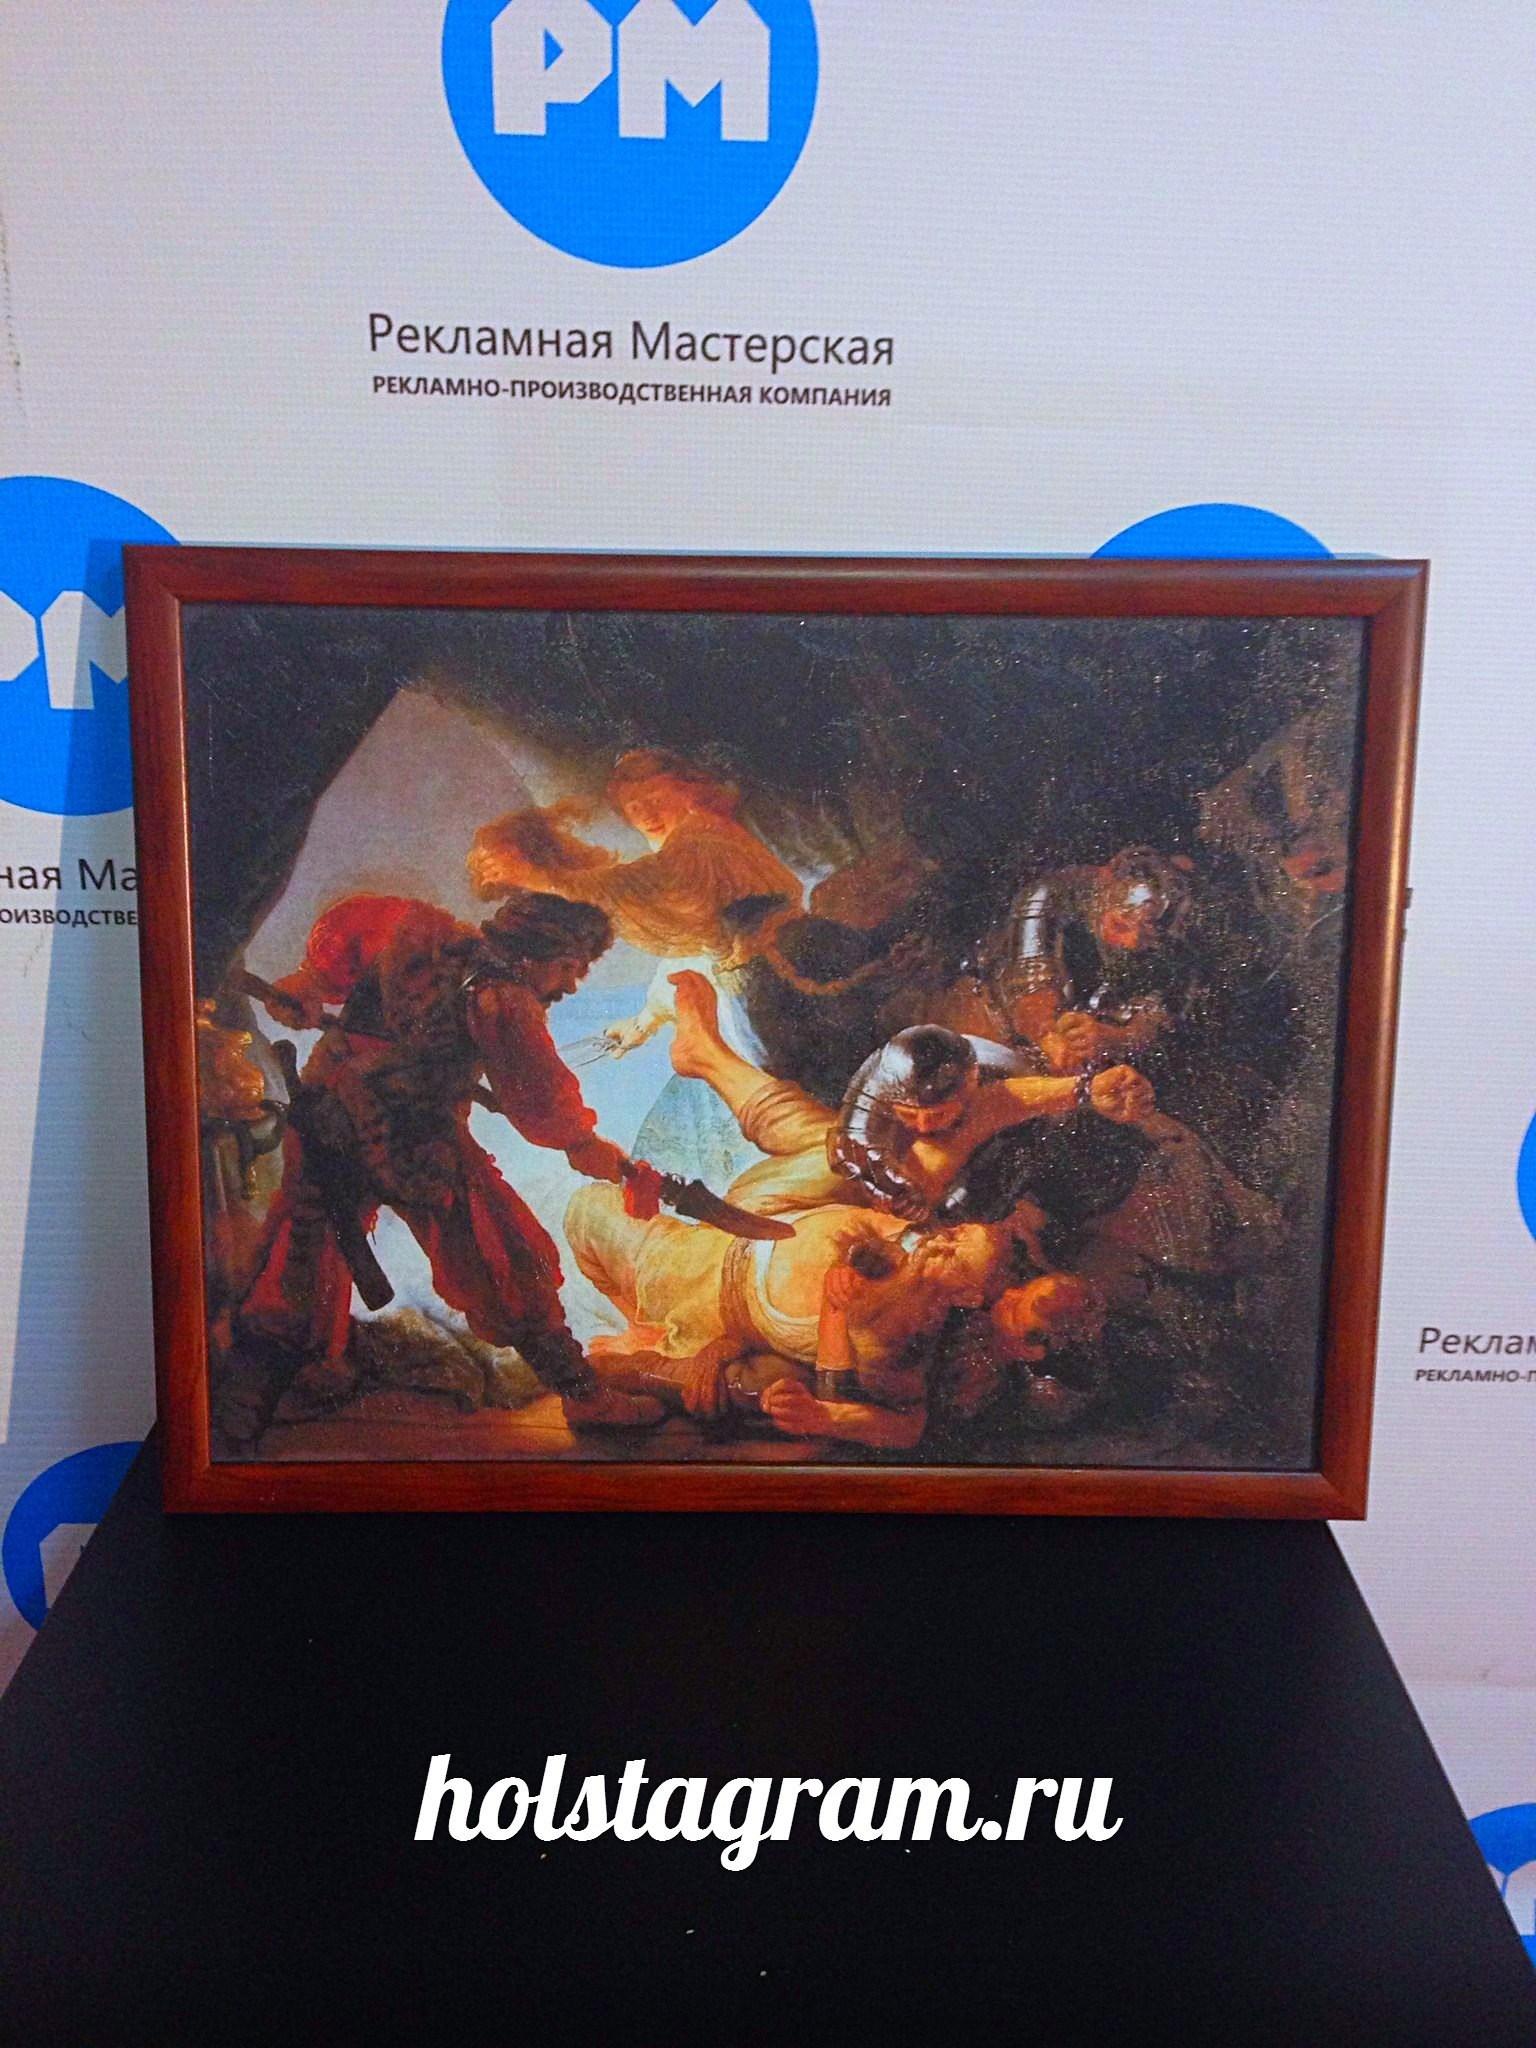 Репродукция на холсте Рембрандта «Ослепление Самсона»